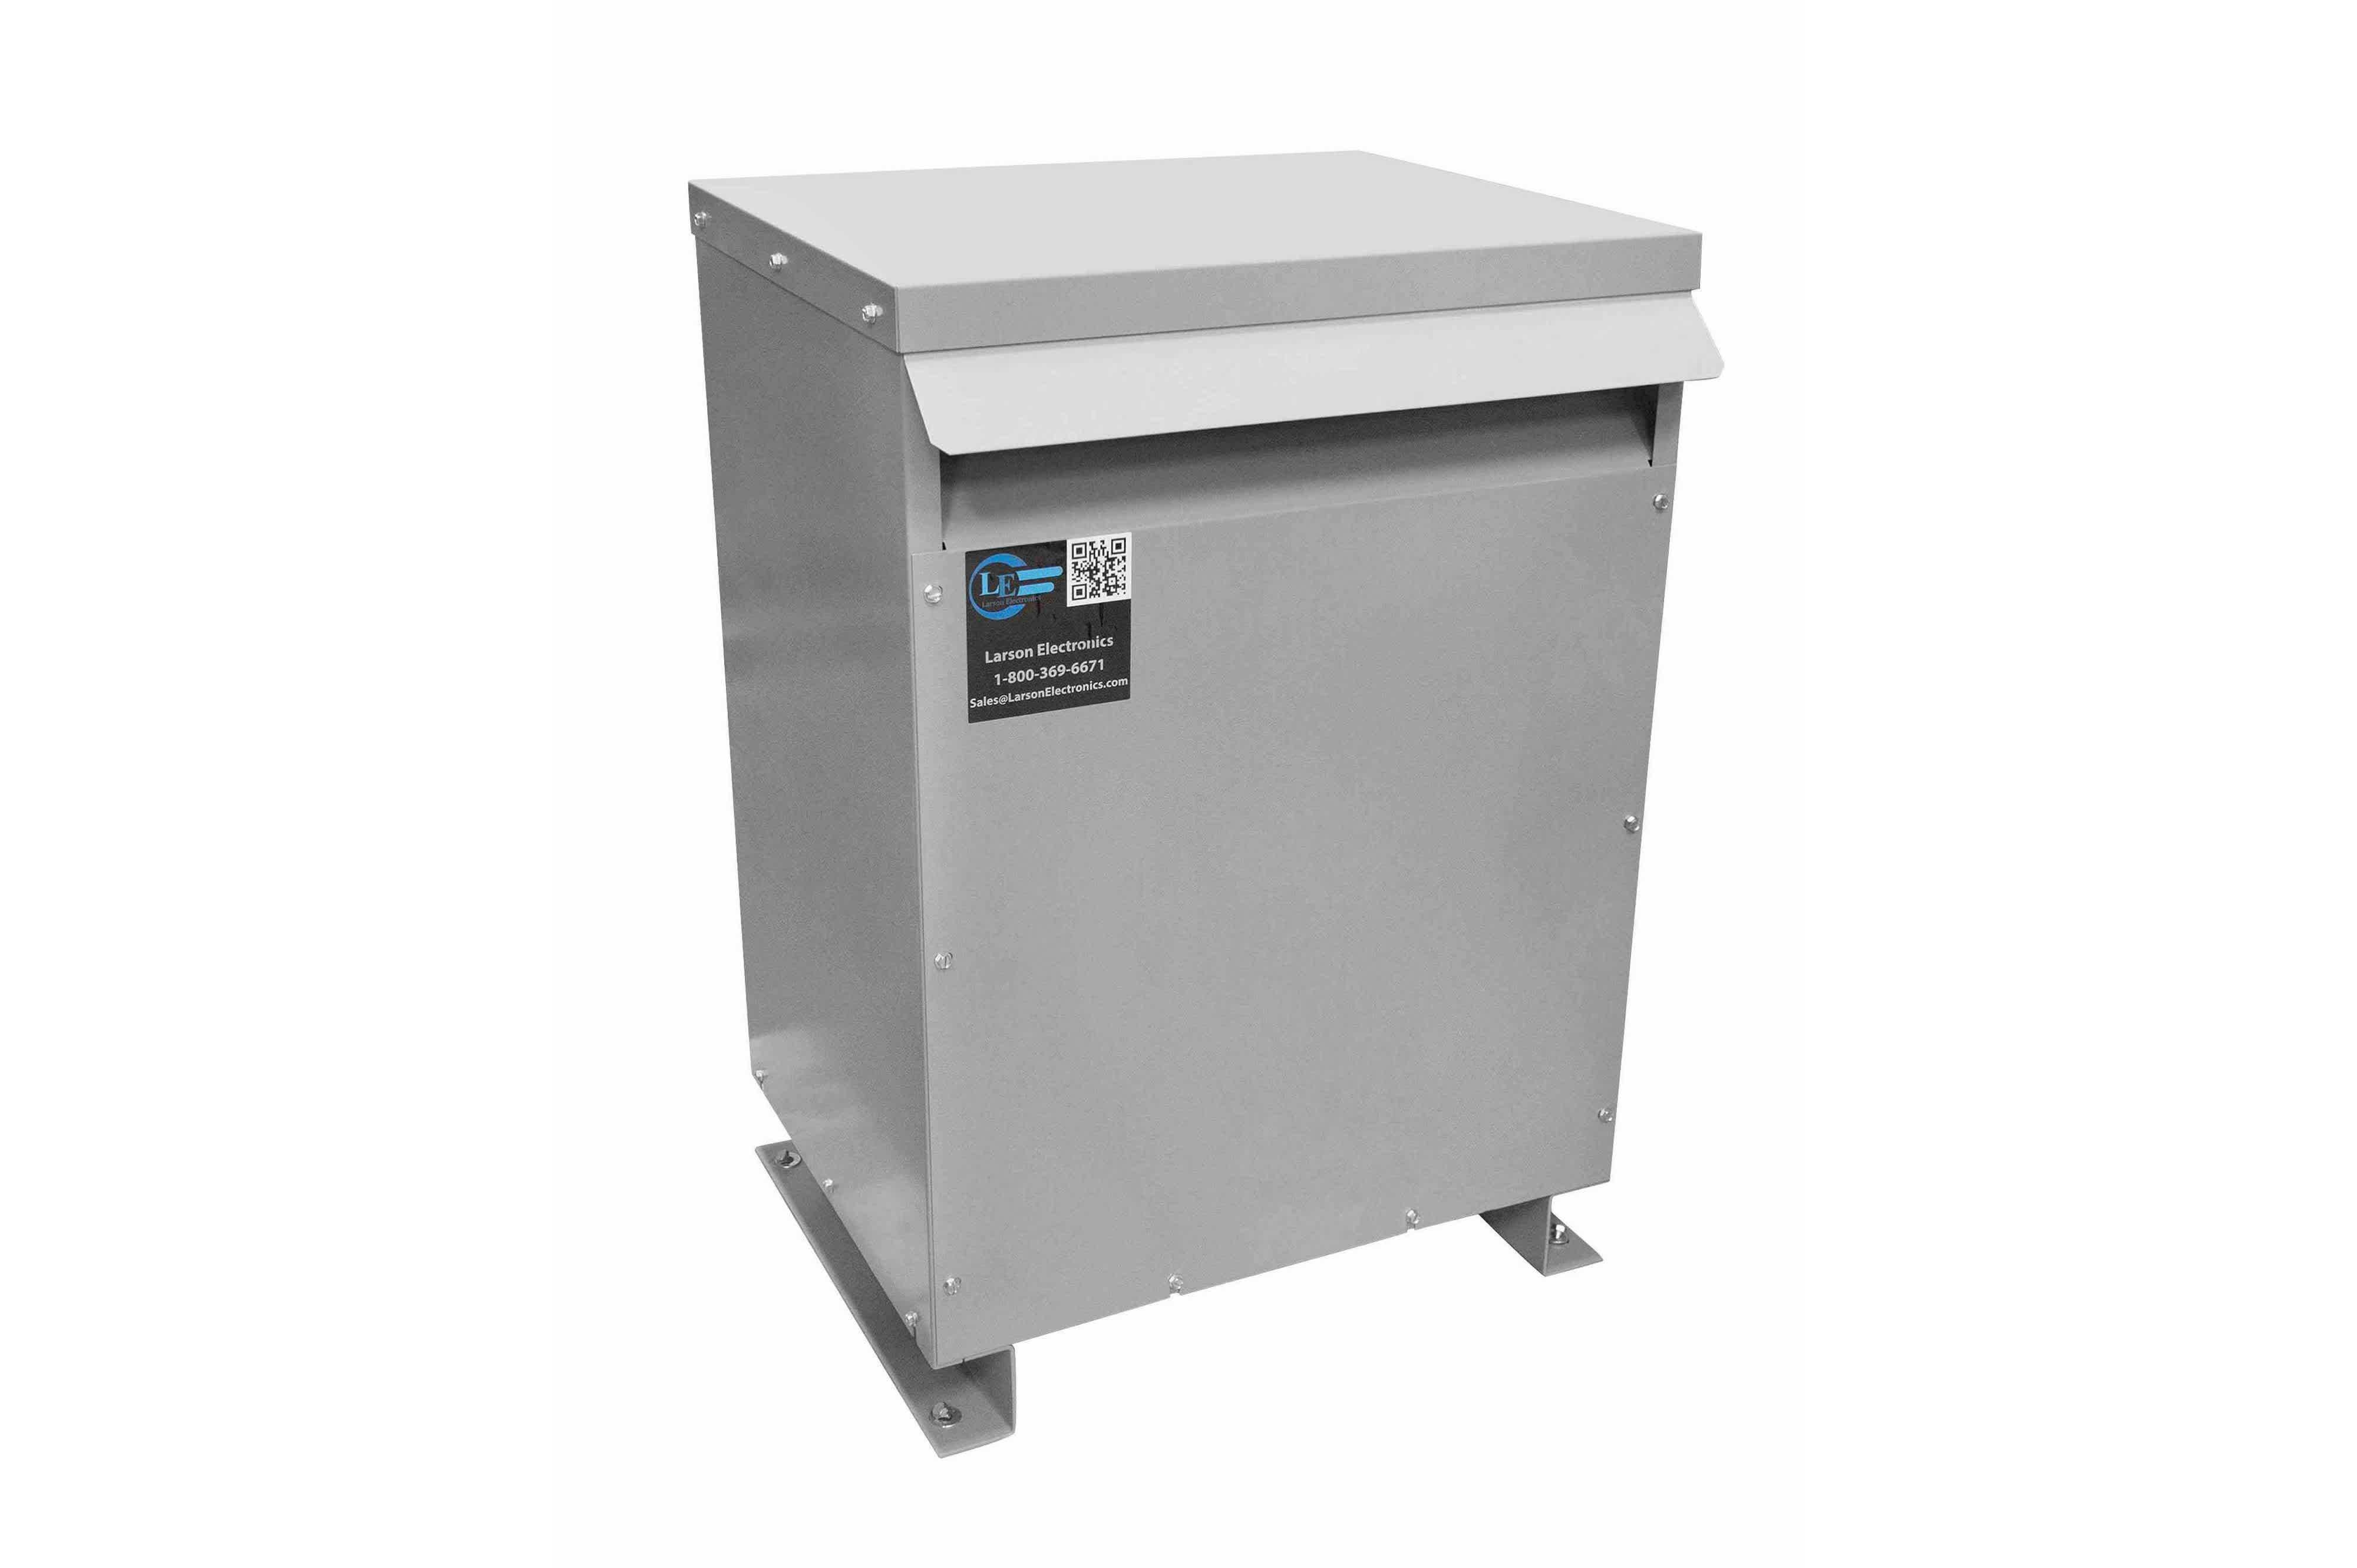 29 kVA 3PH Isolation Transformer, 480V Wye Primary, 480Y/277 Wye-N Secondary, N3R, Ventilated, 60 Hz